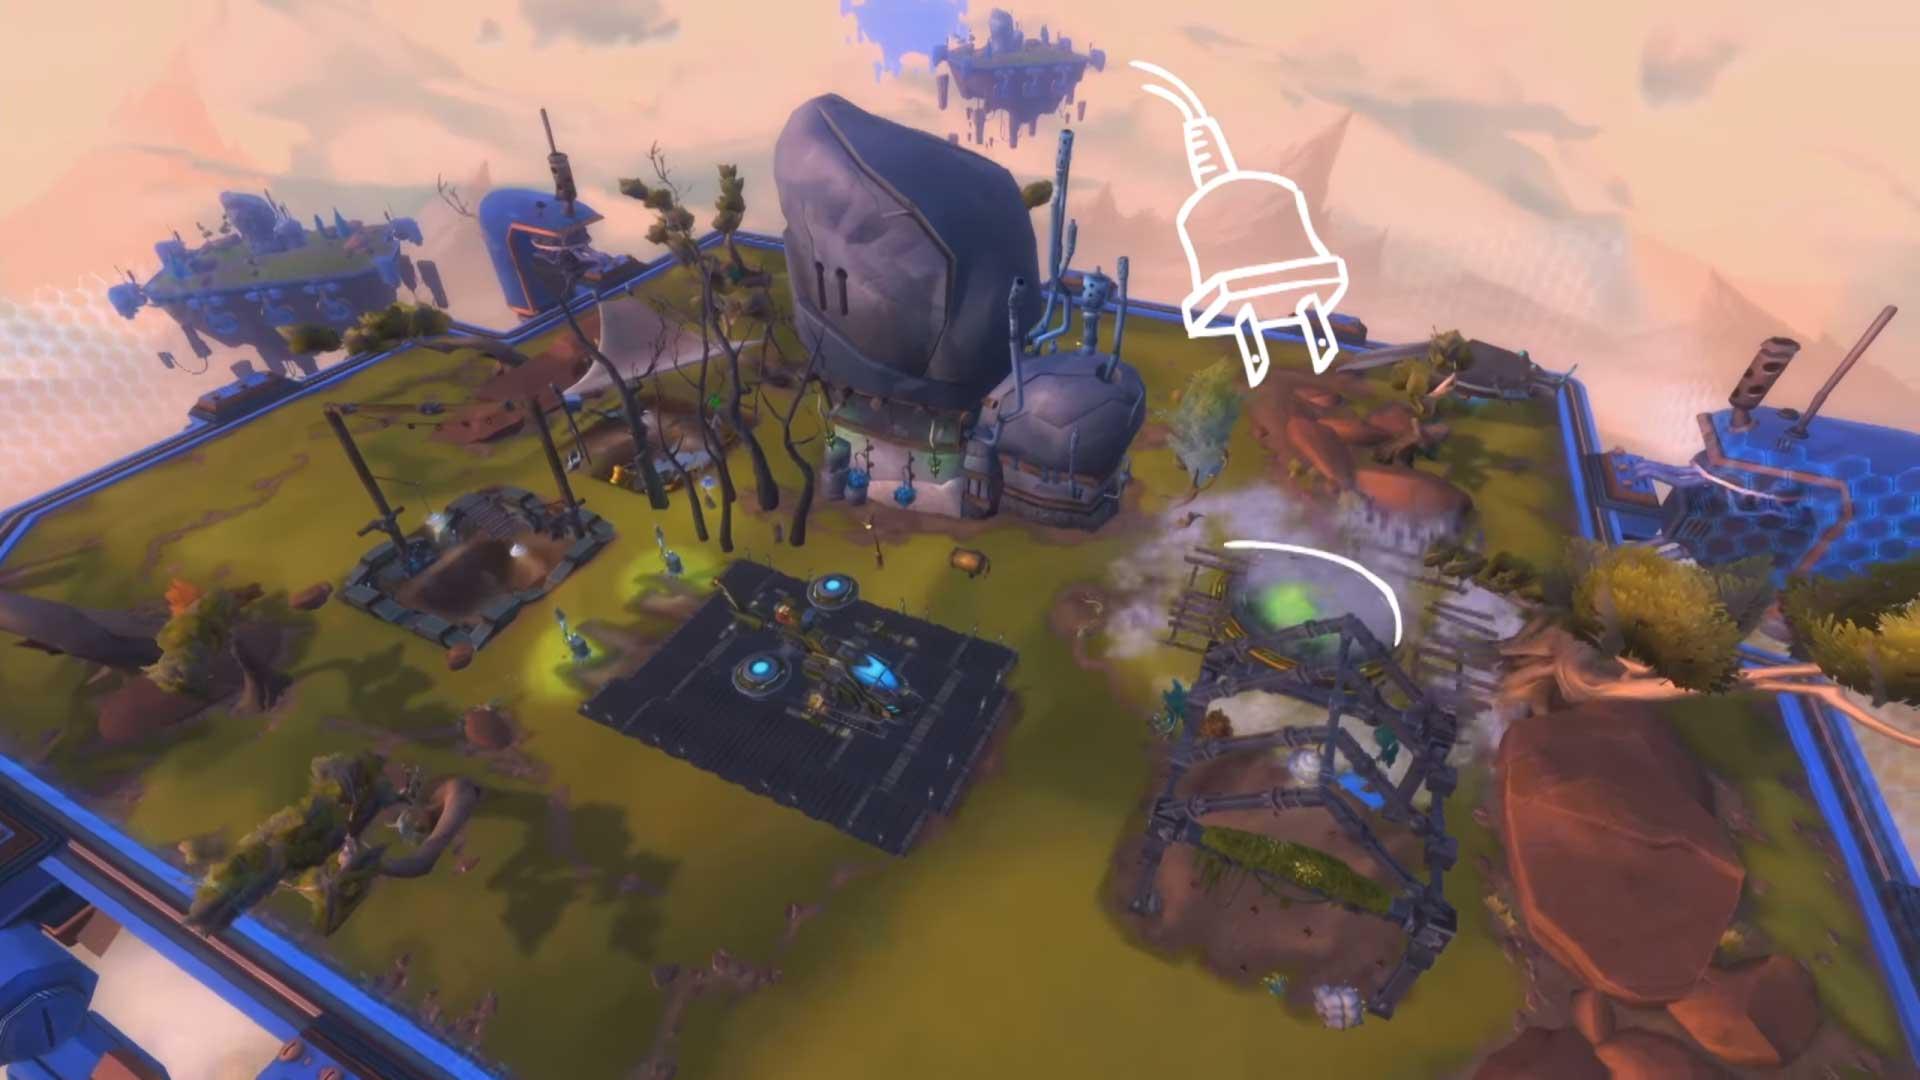 Housing-w-MMORPG-Wildstar-4